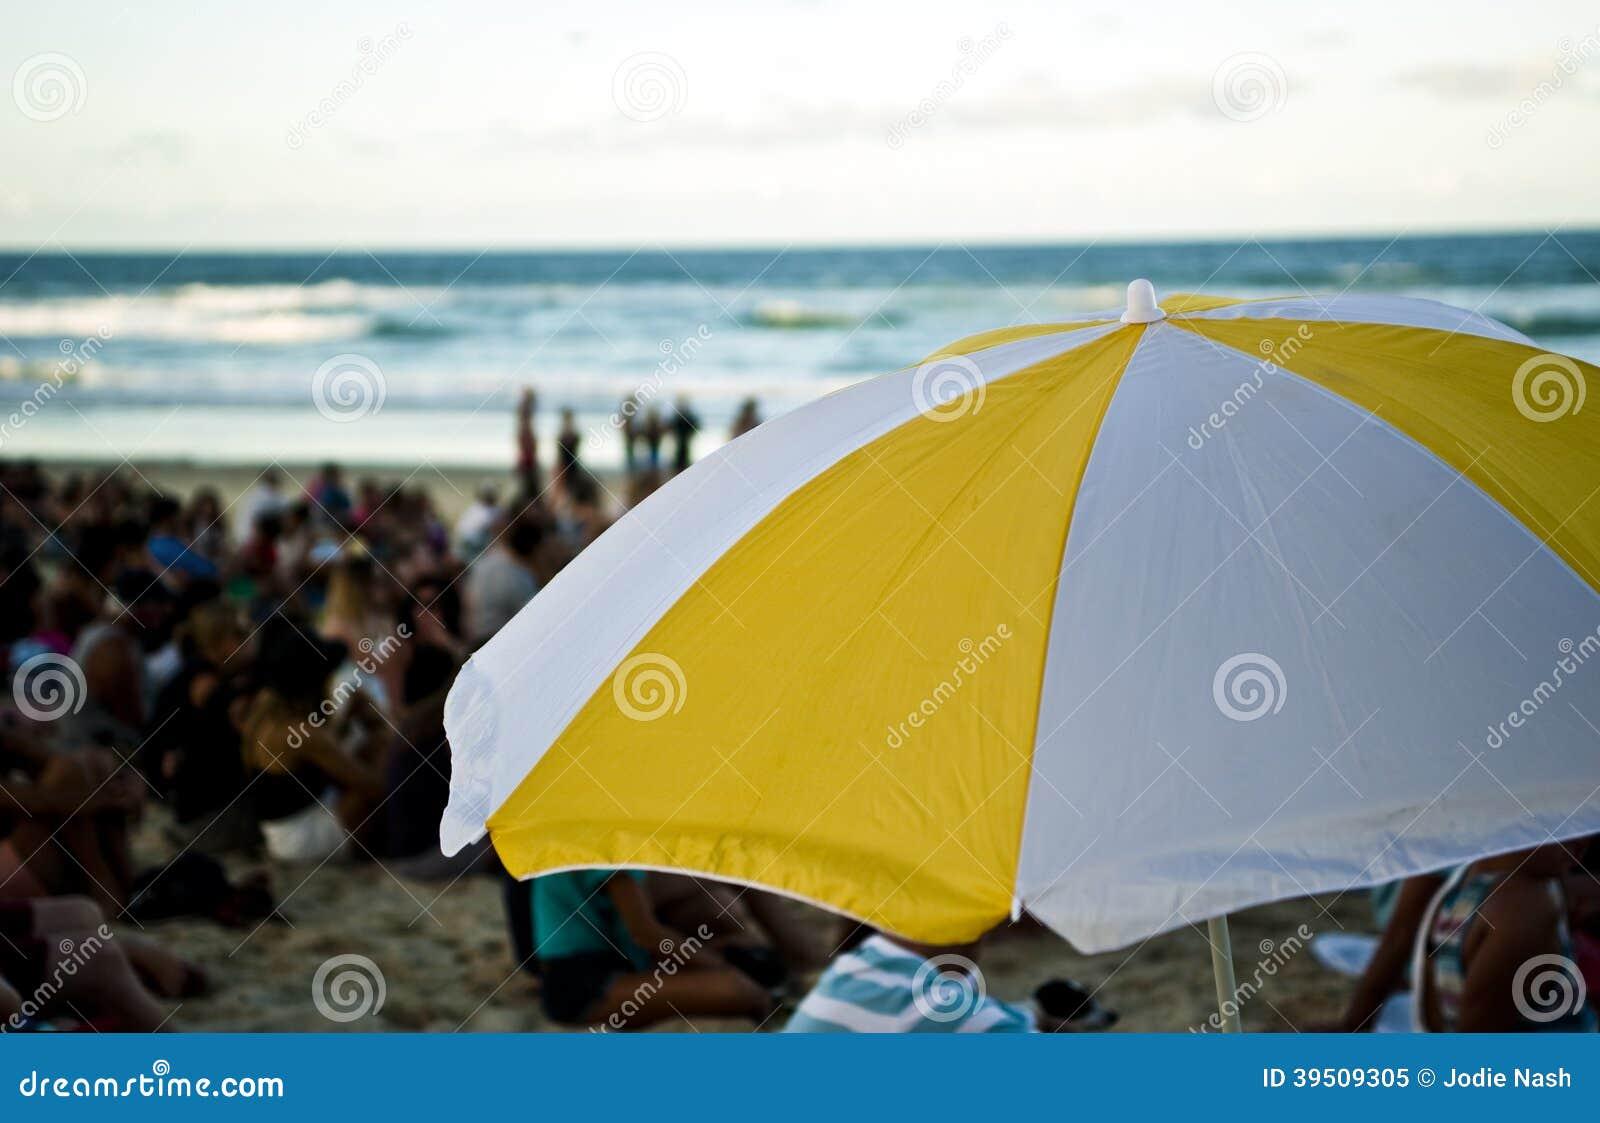 Umbrella at beach festival